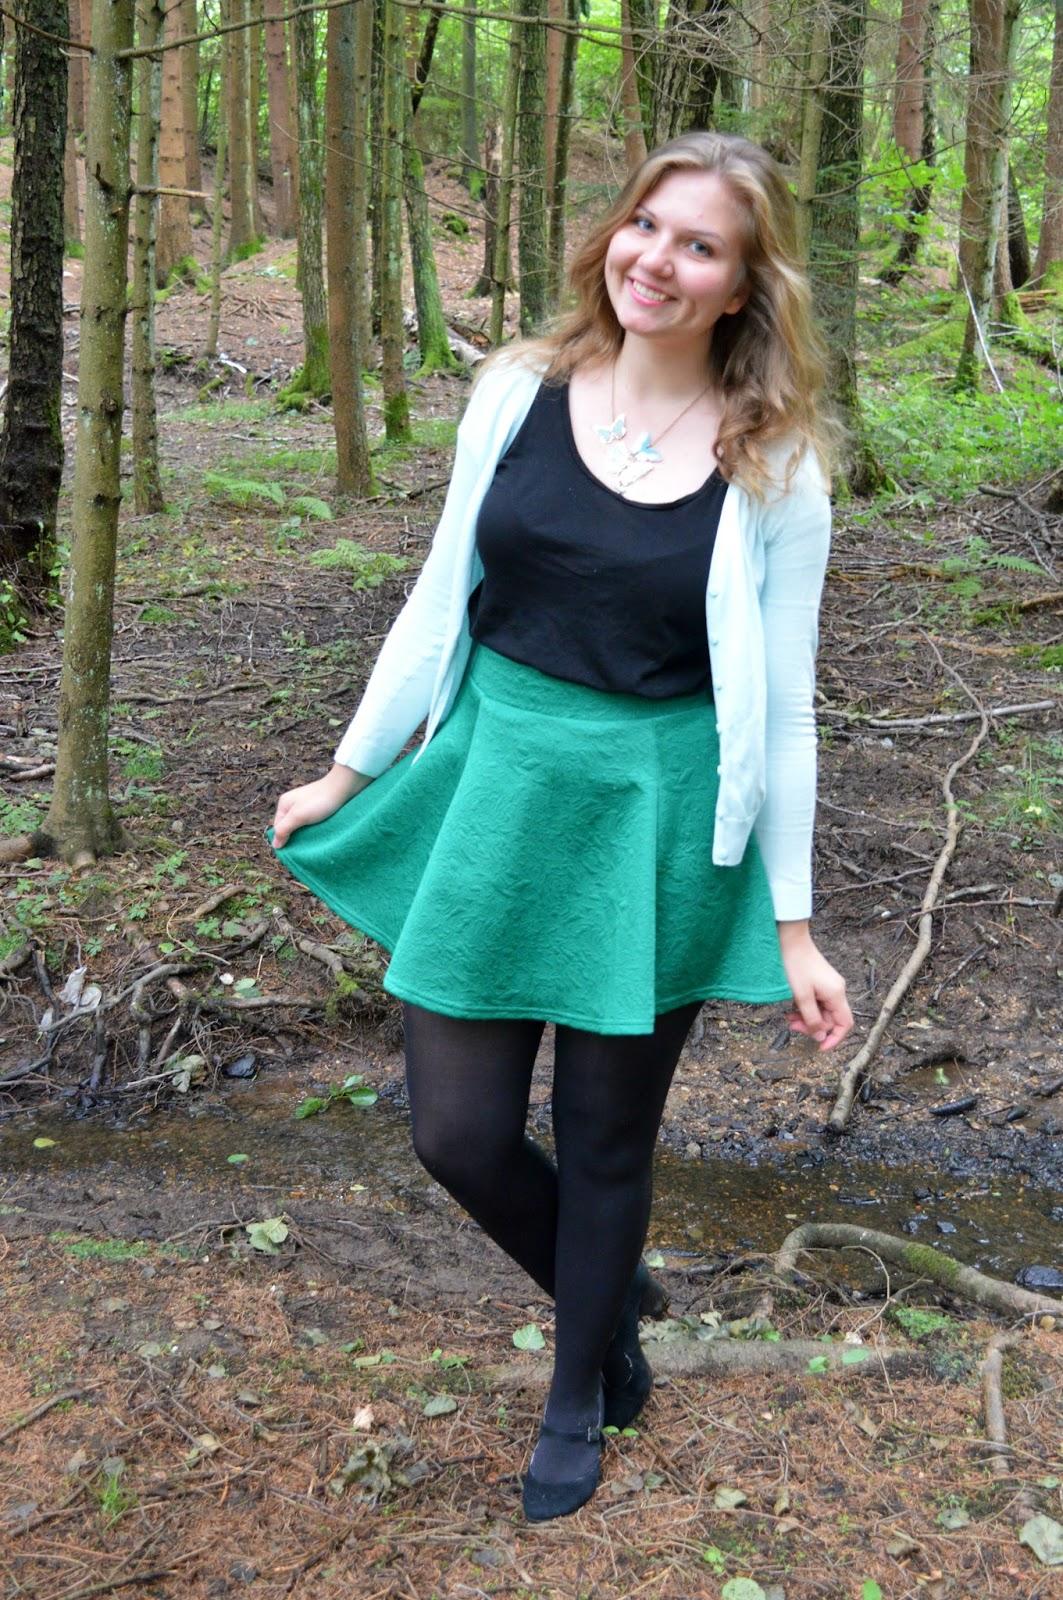 heartshapedrose.blogspot.co.uk - Fashionmylegs : The